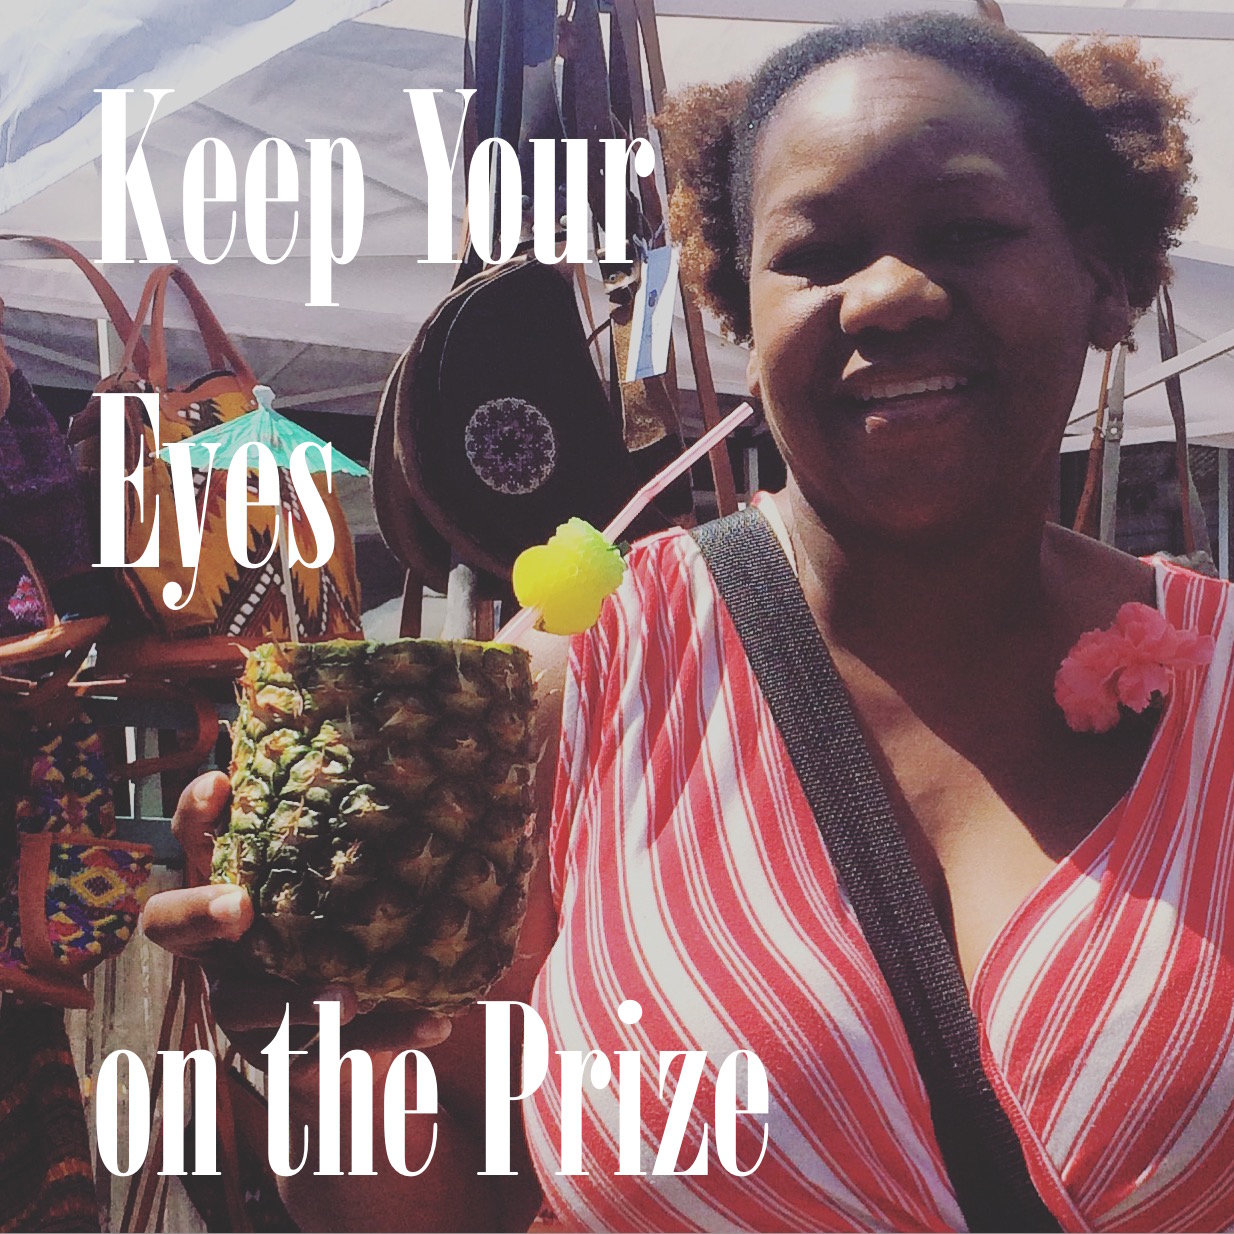 The FEMININE PRONOUN series # 16: Keep Your Eyes on the Prize